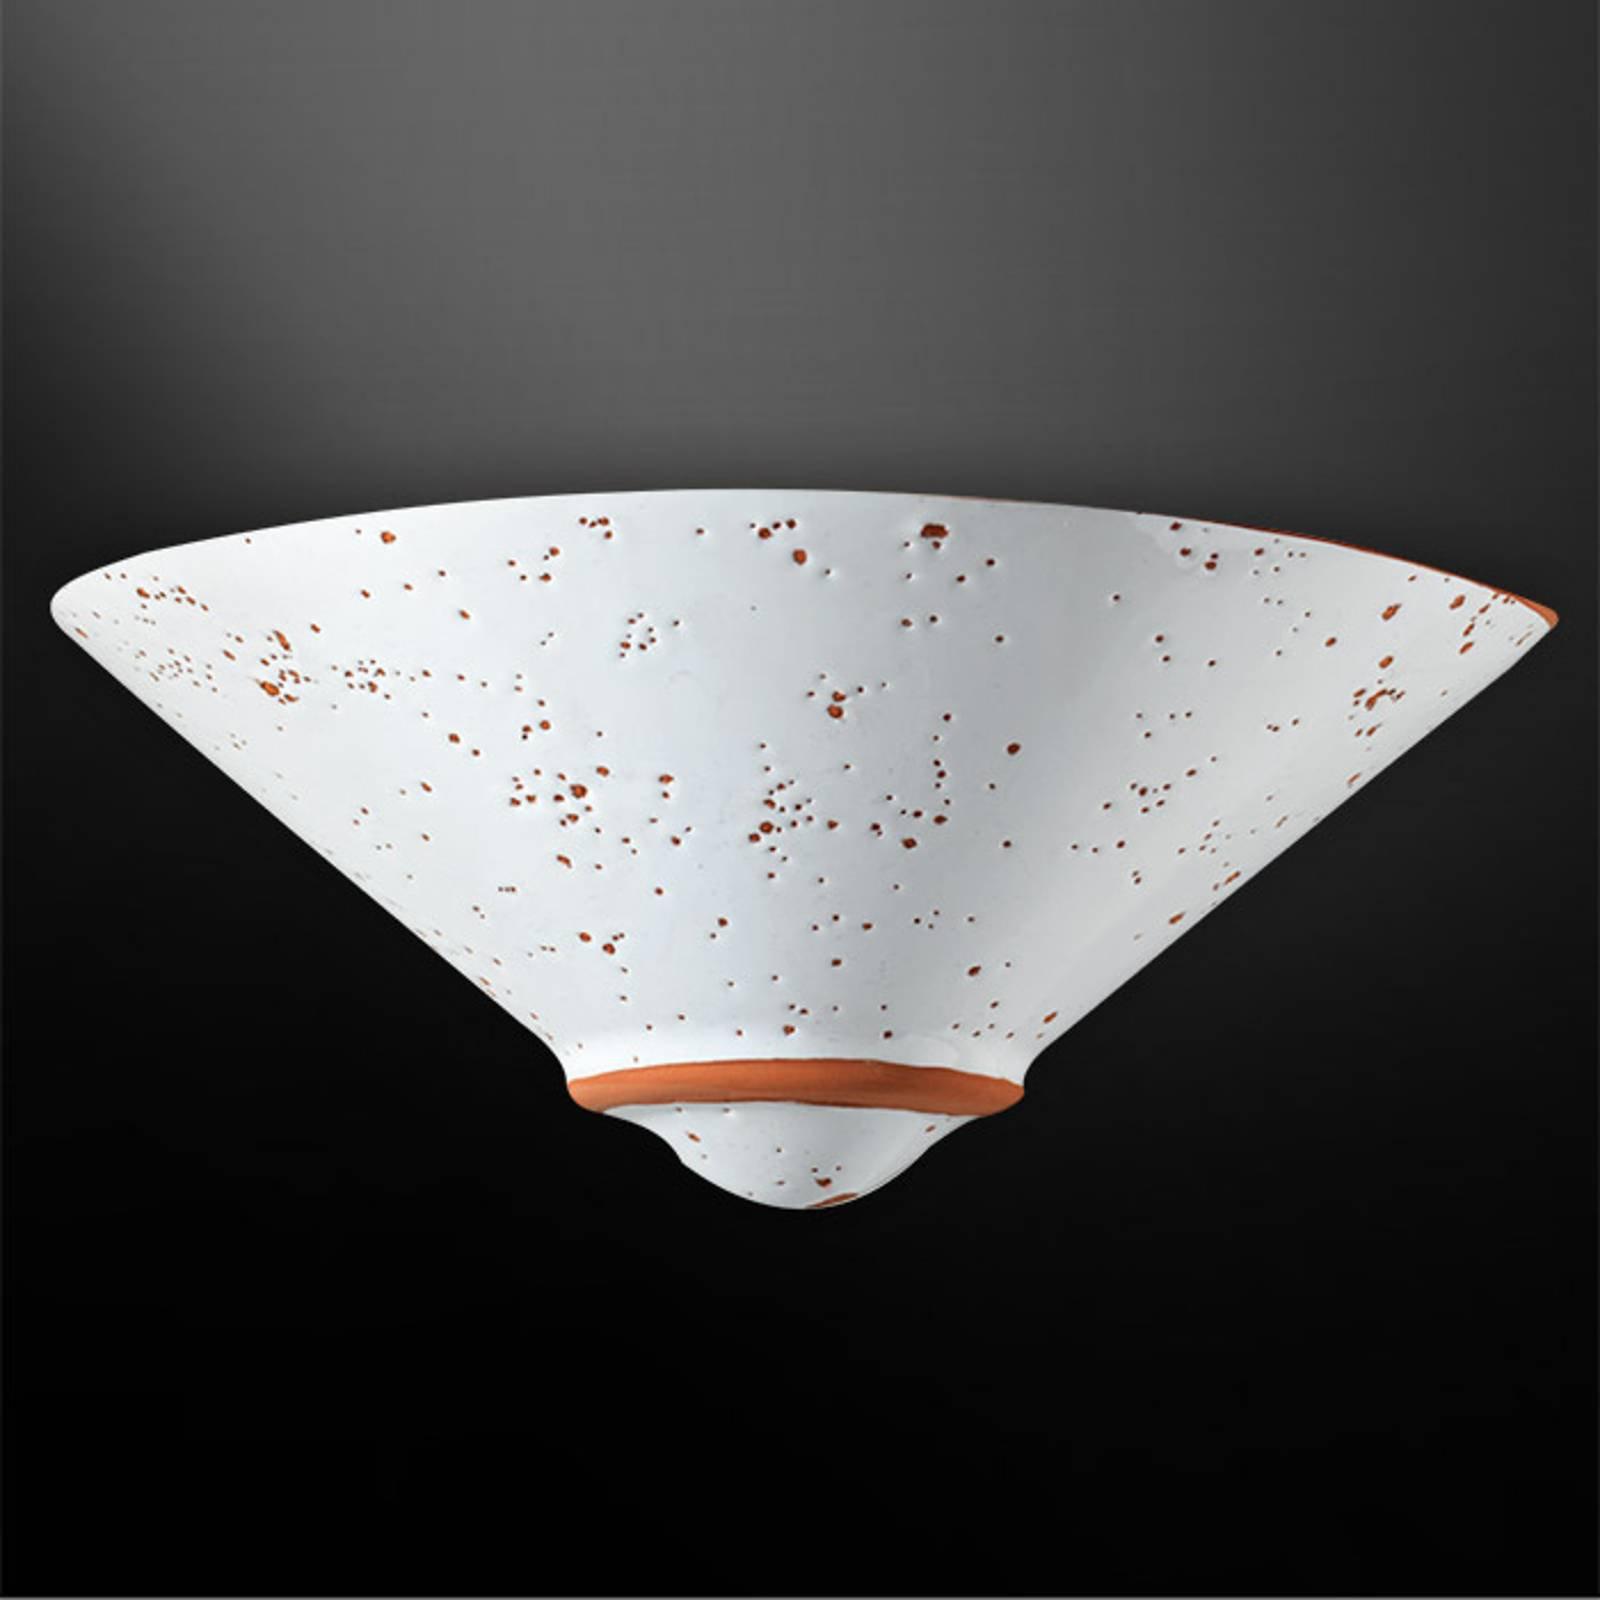 Vegglampe Caroline med terrakottadetaljer